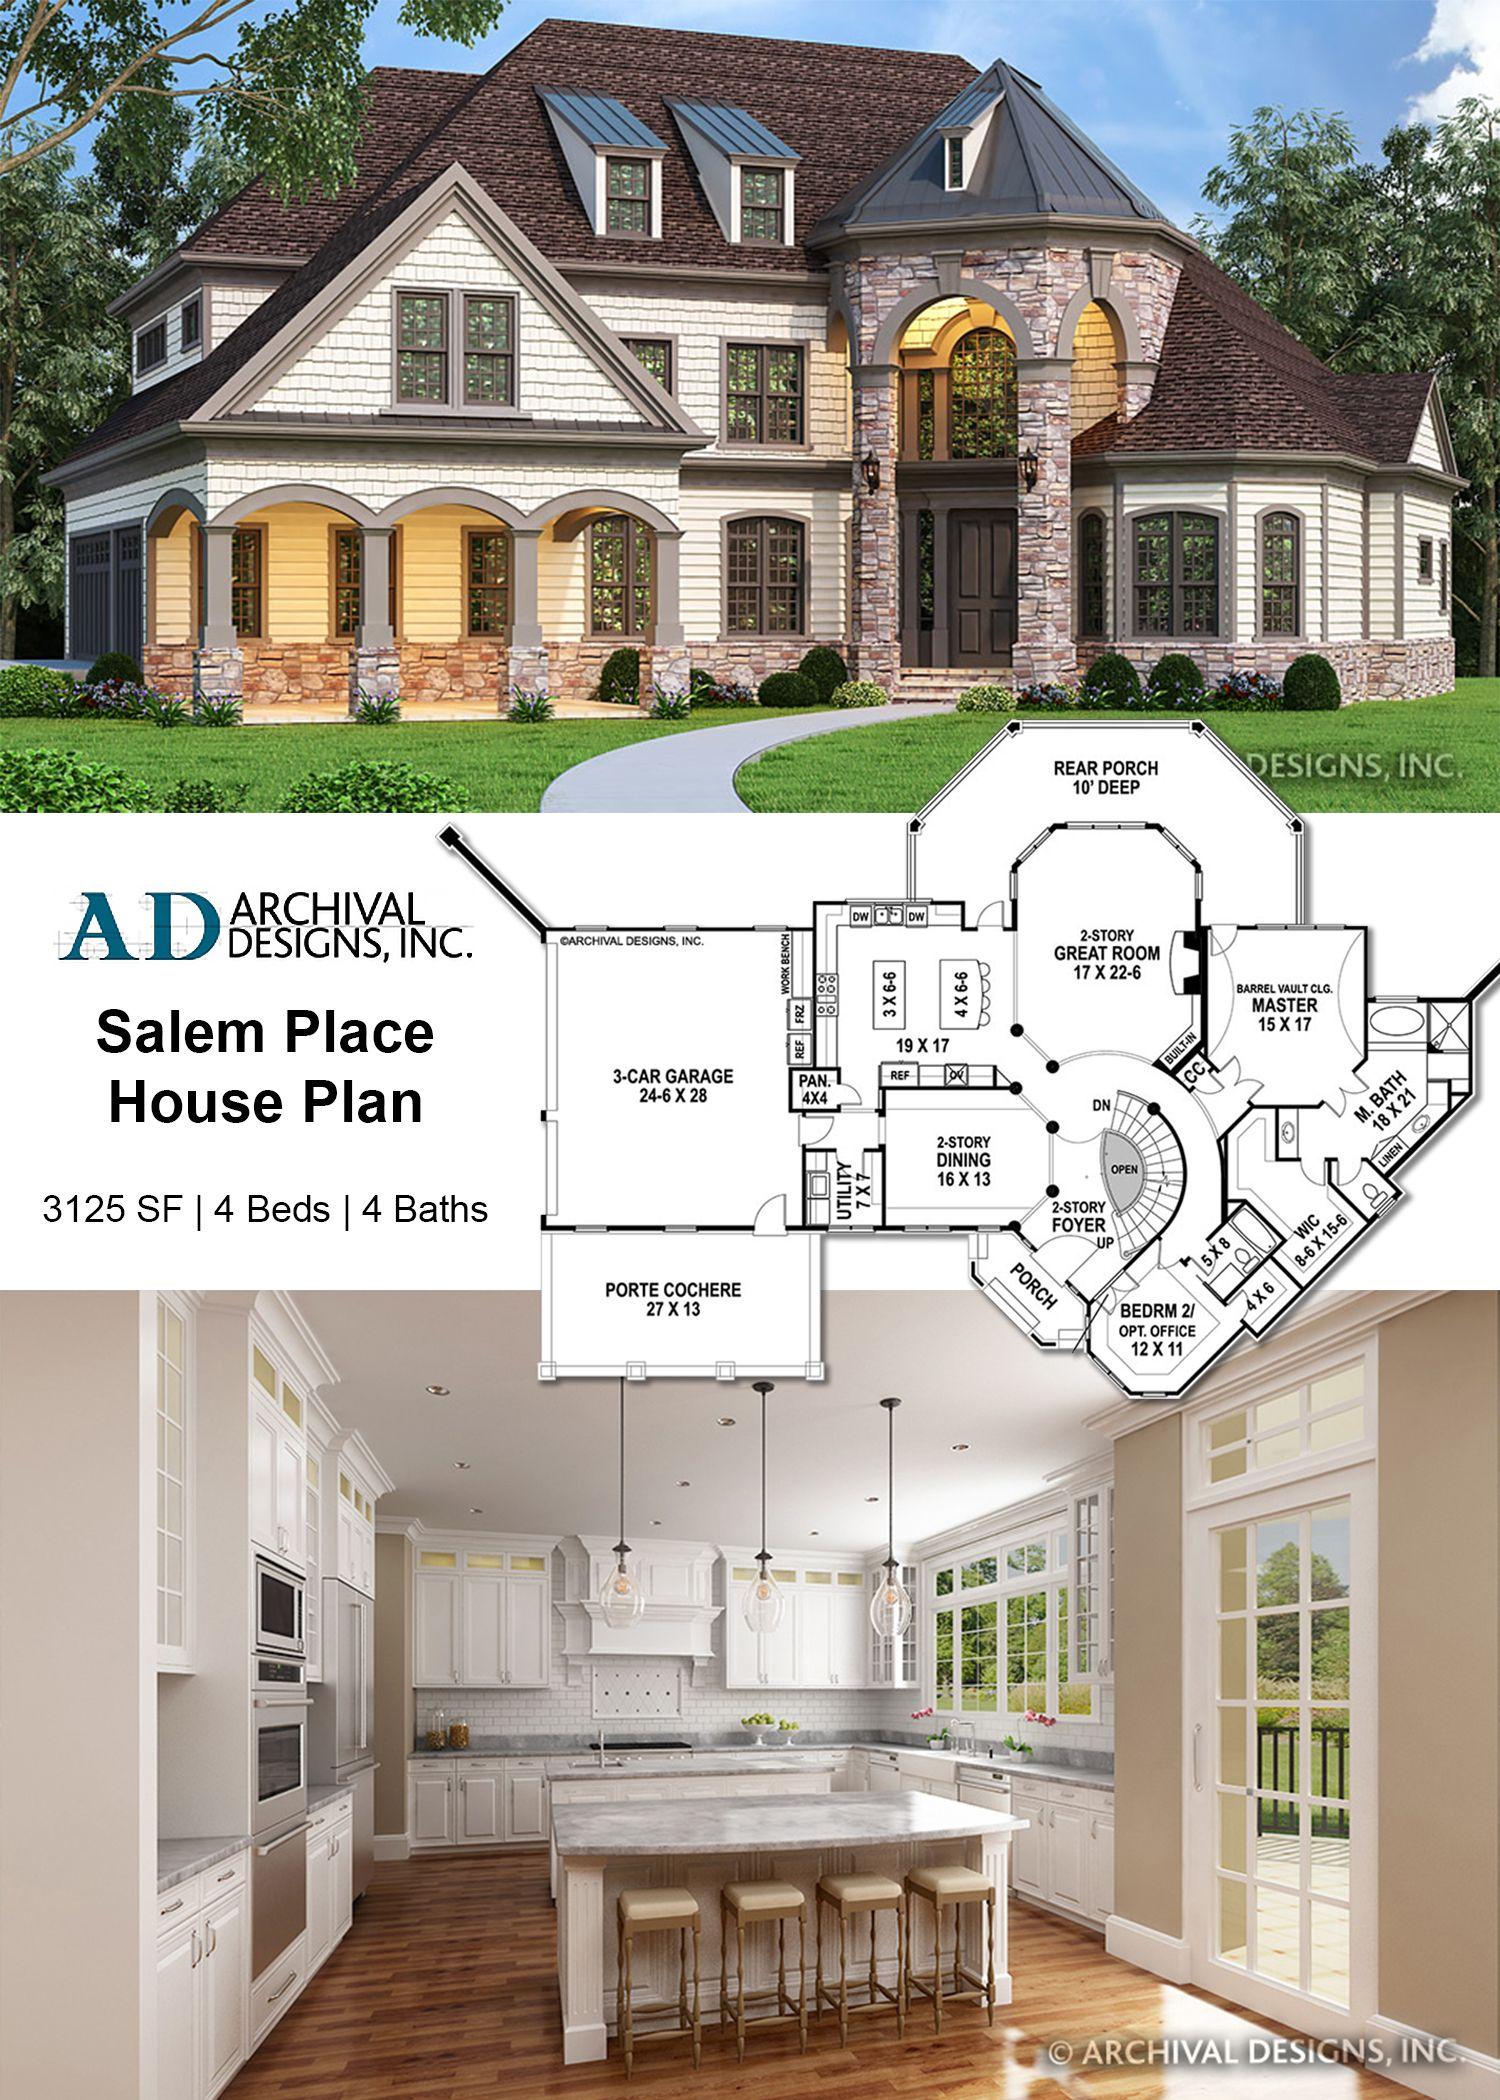 Salem Place House Plan House Plans Craftsman House Plans   Grand Staircase House Plans   Curved Staircase   3 Car Garage   Acadian Home Interior   Single Story   1800 Square Foot